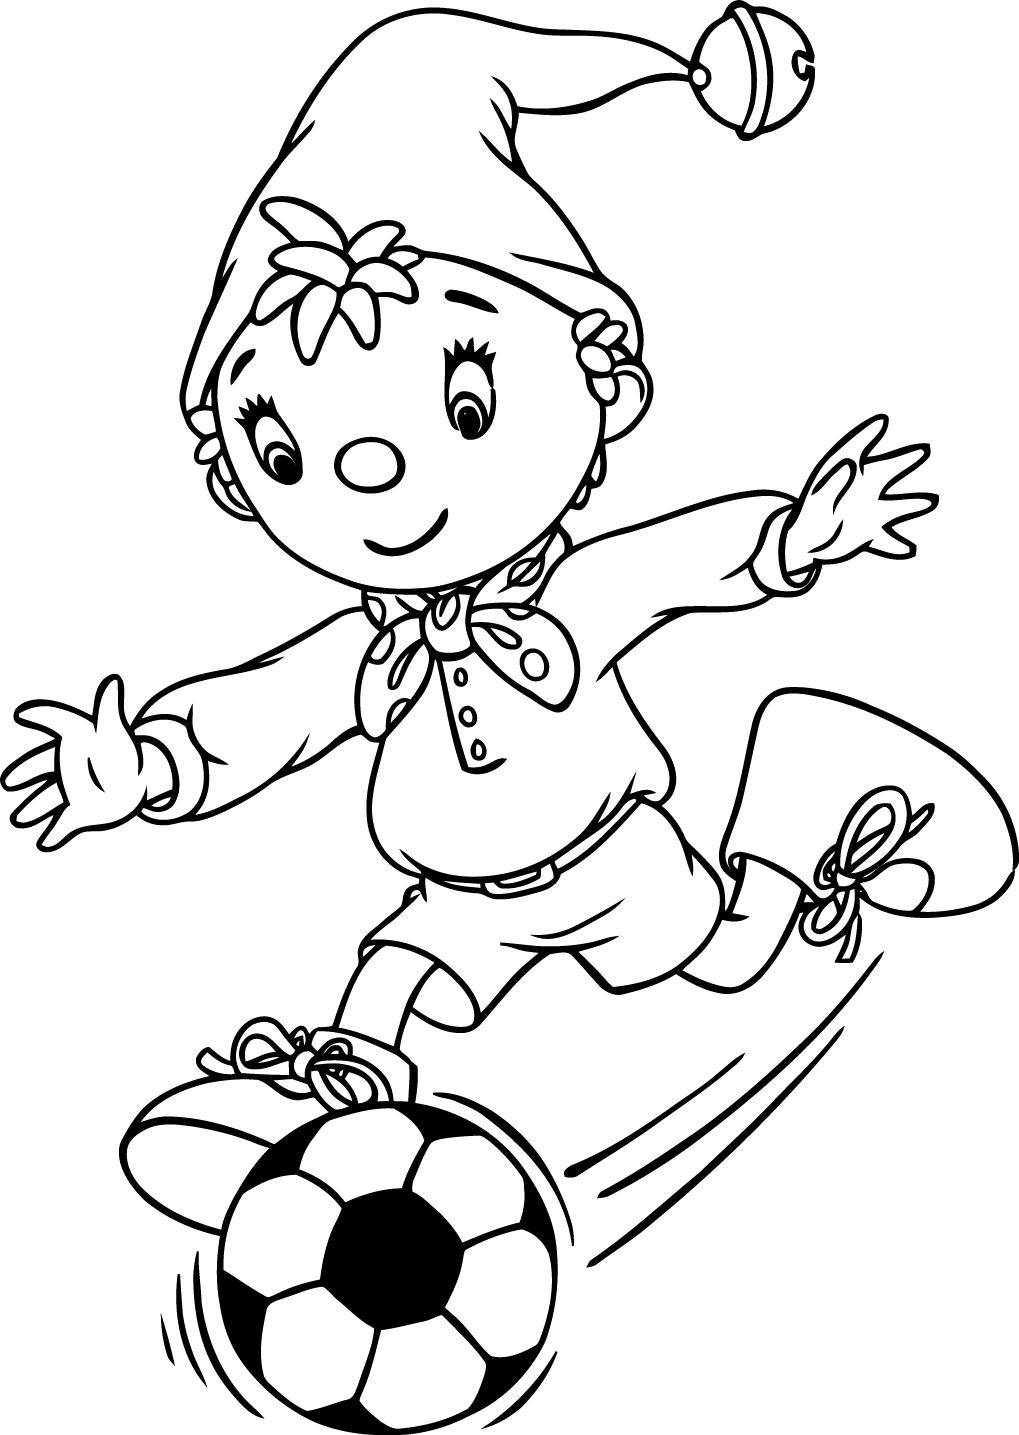 1019x1435 Nice Noddy 97 Play Football Coloring Page Mcoloring